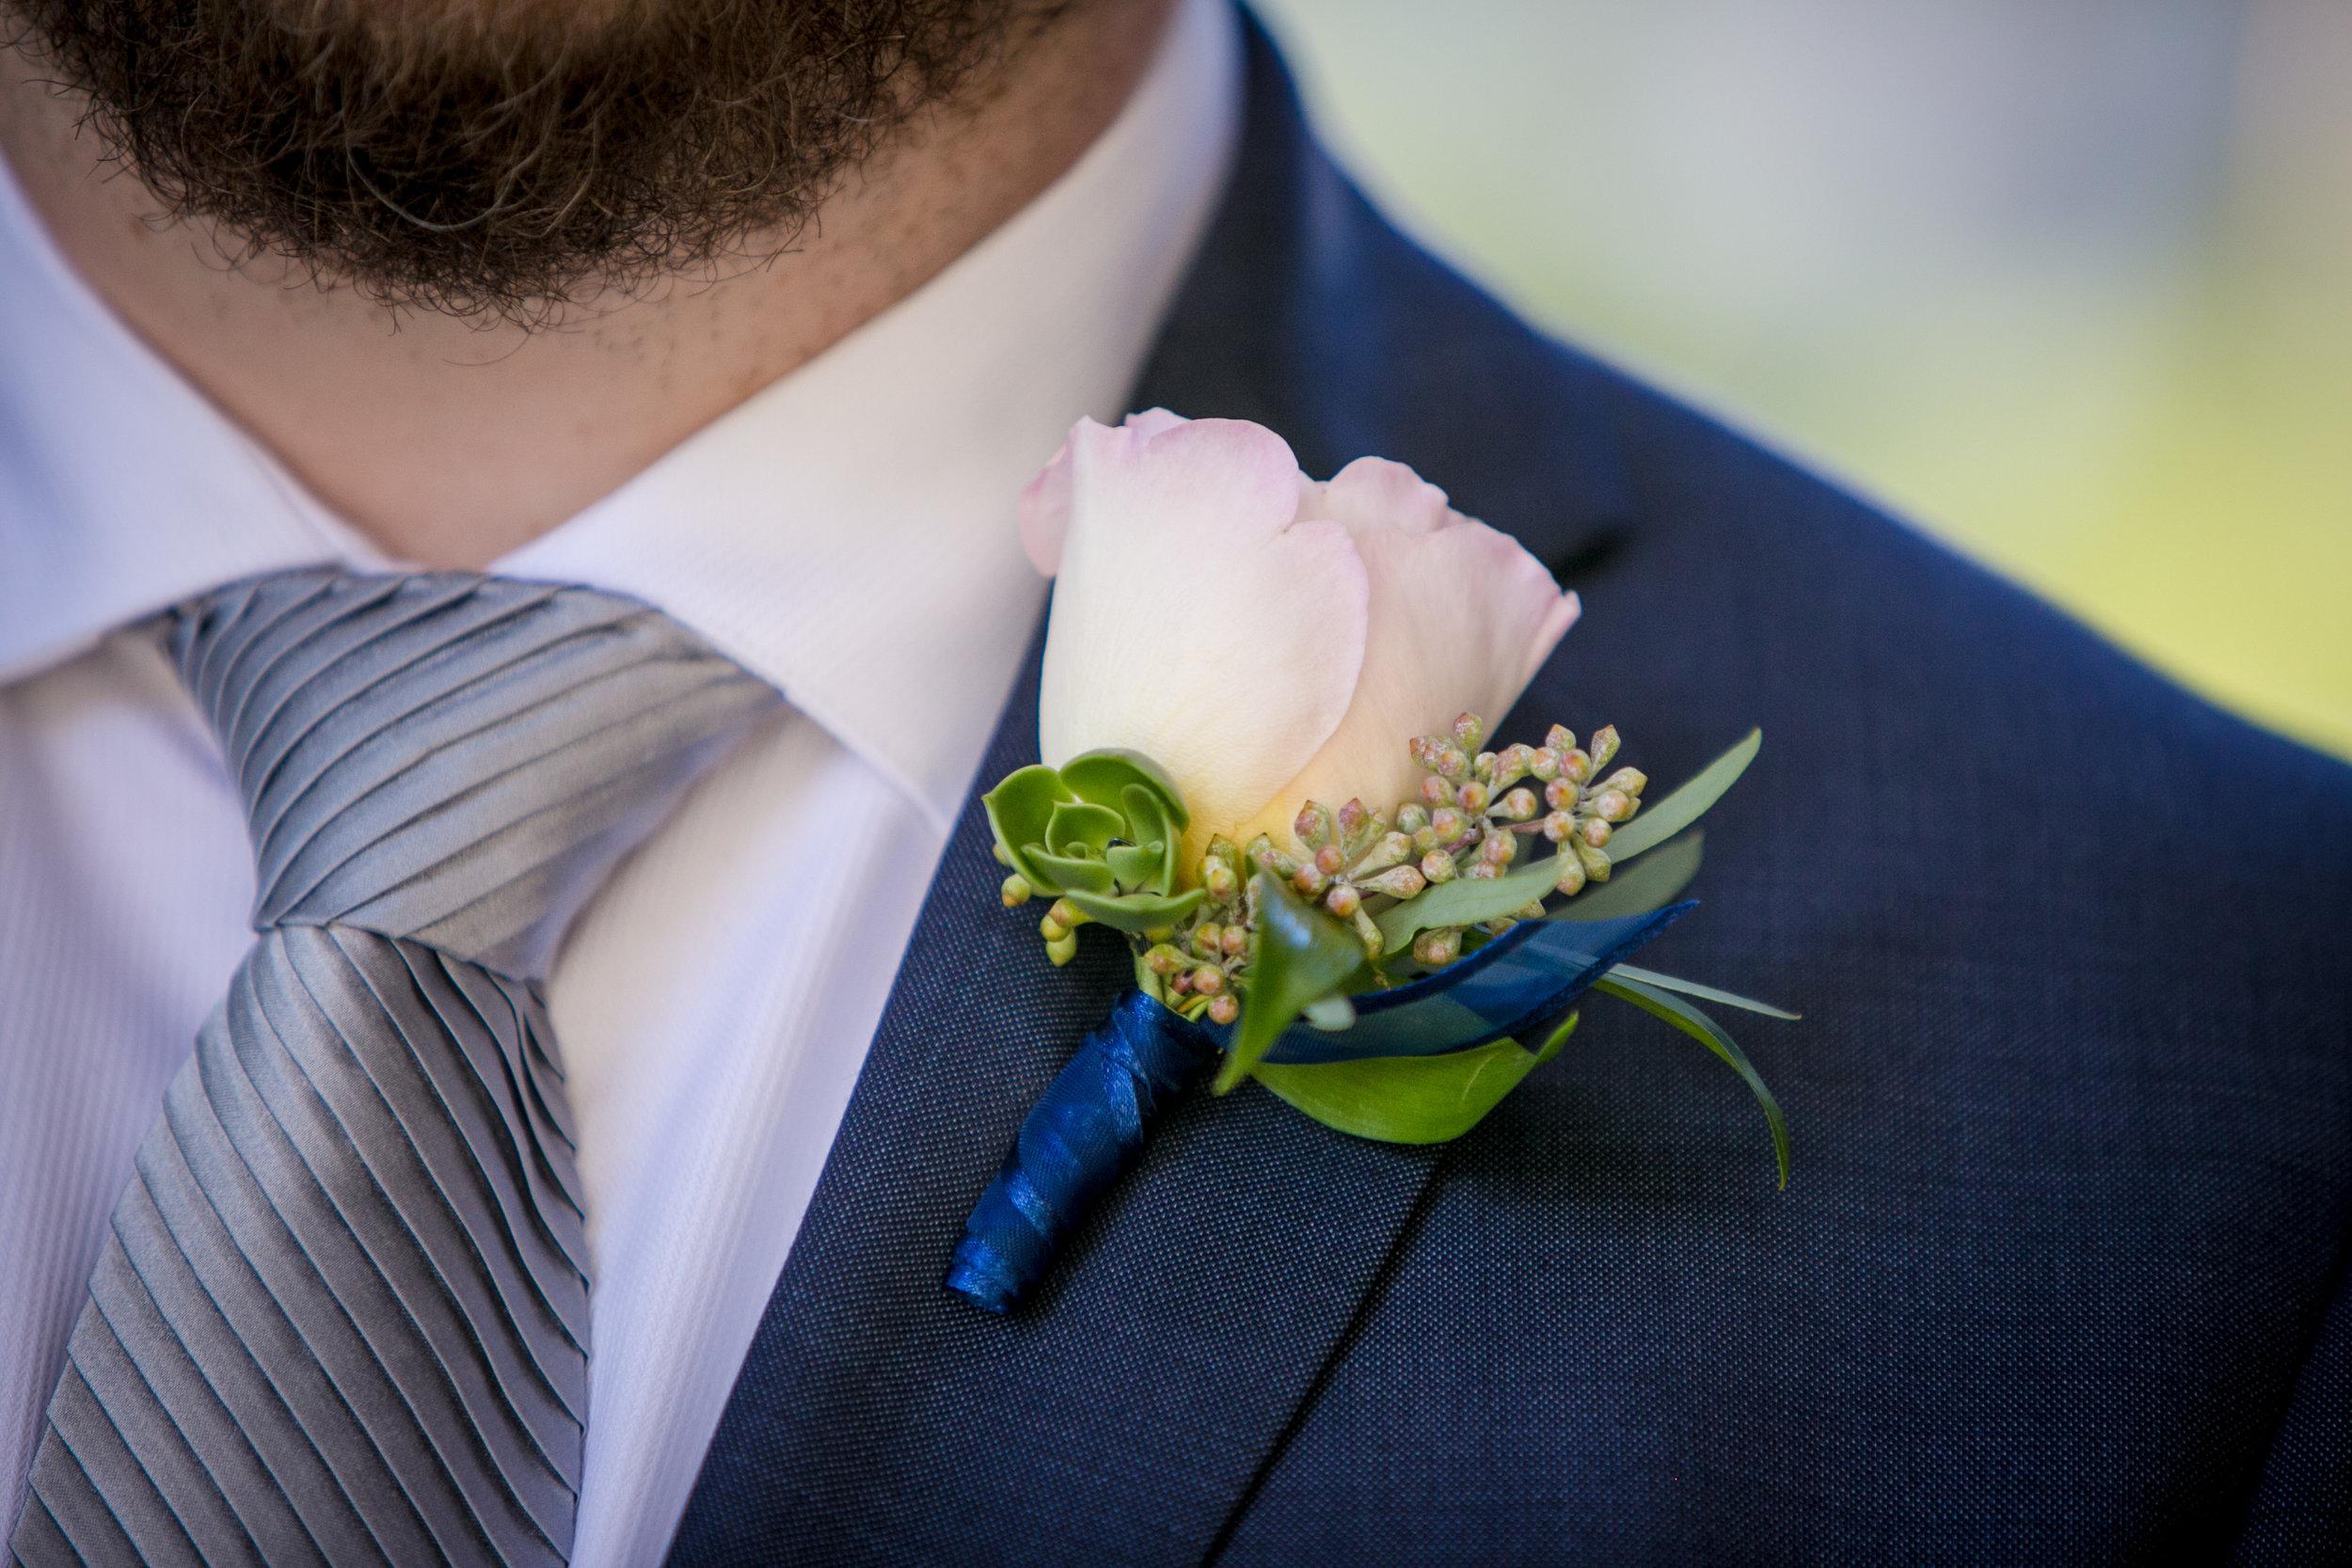 Groom_Boutonniere_Blush_Garden_Rose_Vizcaya_Sacramento_Violette_Fleurs.jpg